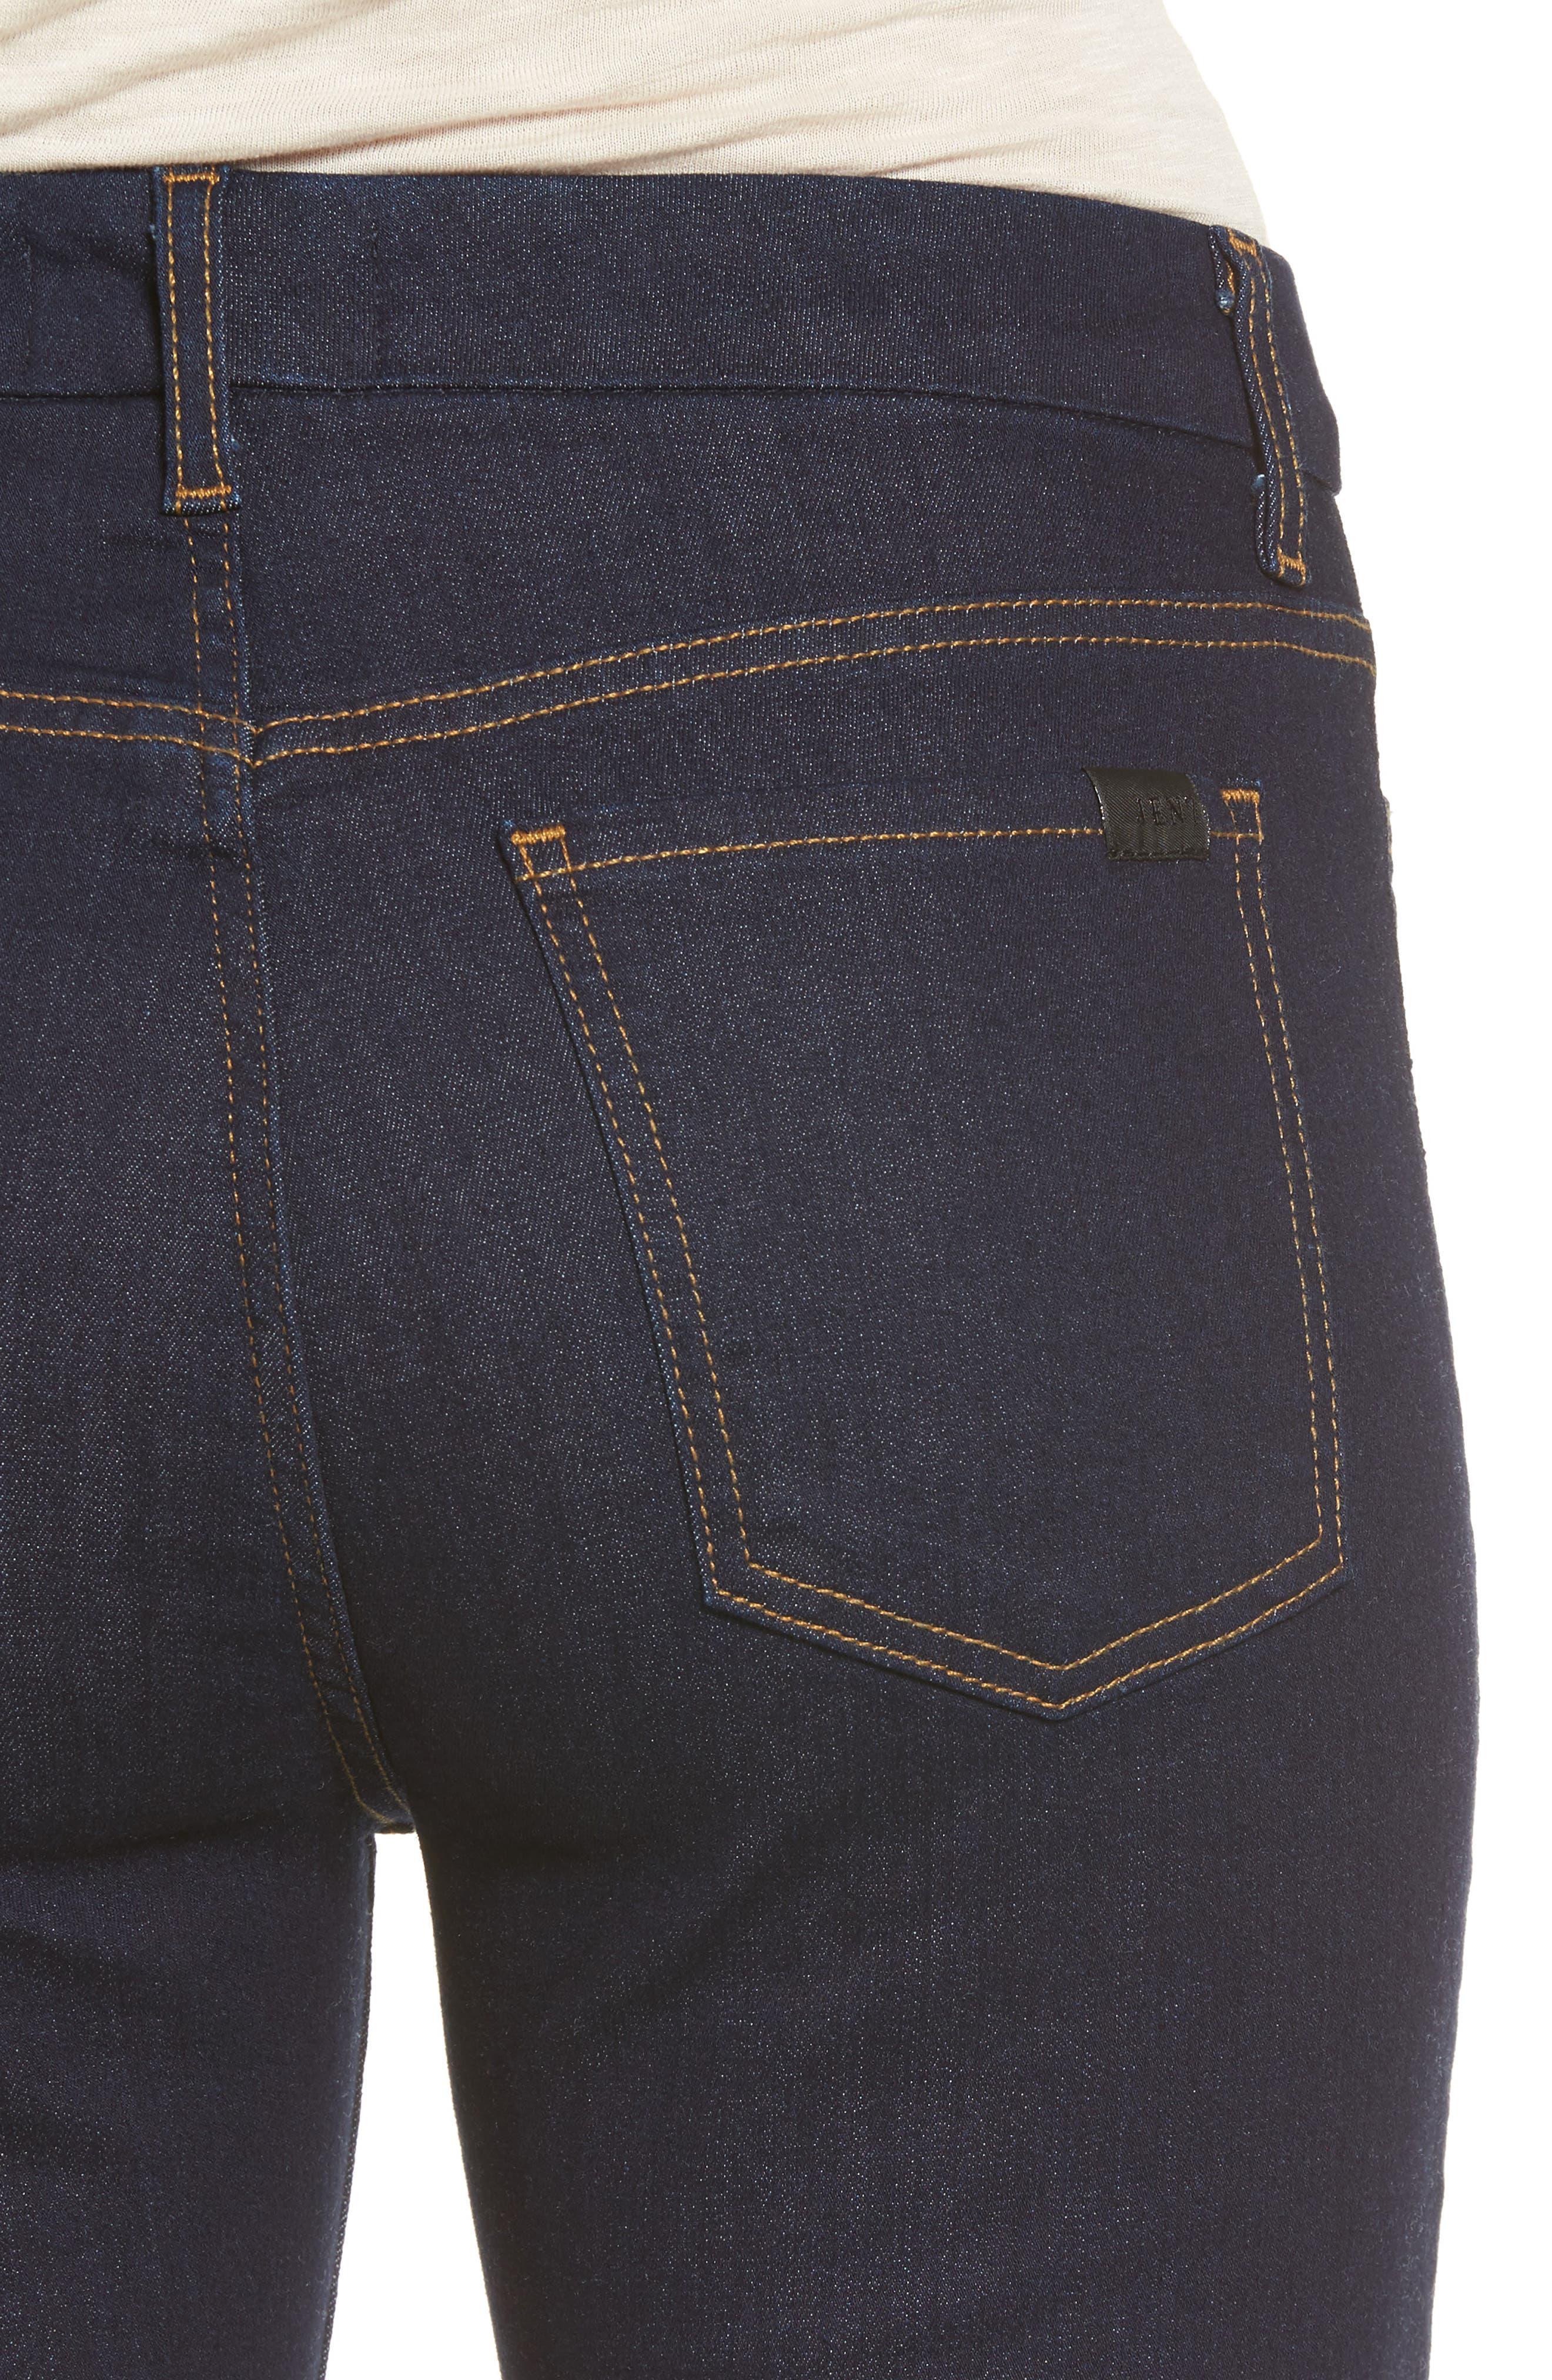 Alternate Image 4  - Jen7 Stretch Slim Straight Leg Jeans (Riche Touch Estancia Blue)